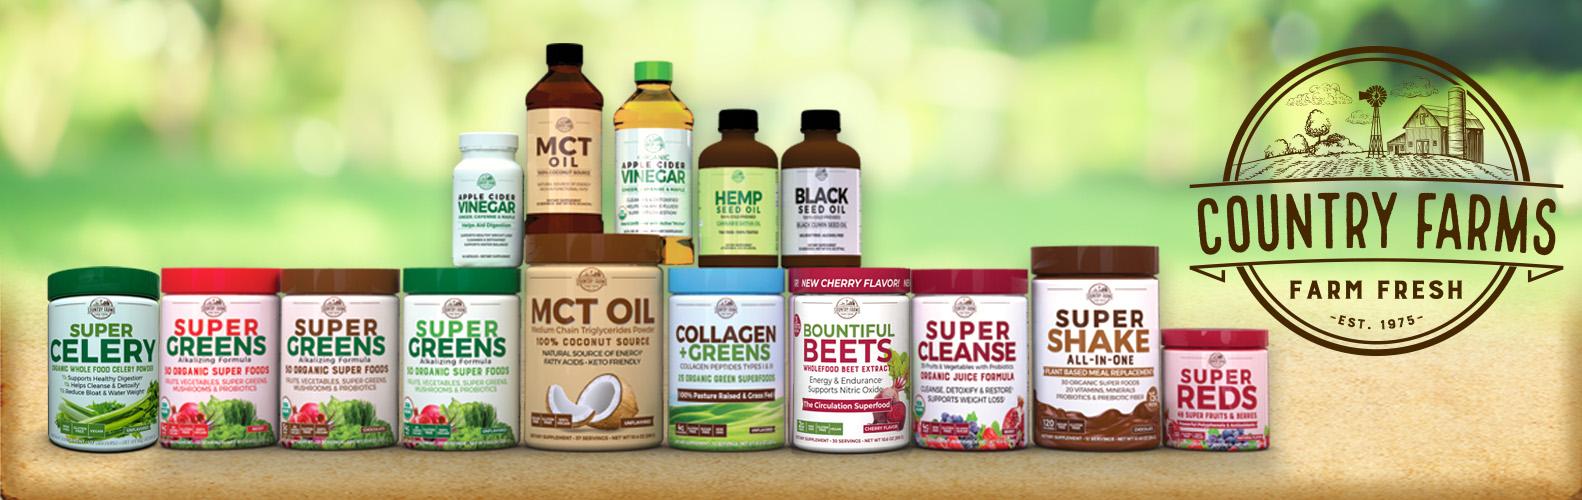 Country Farms Brand